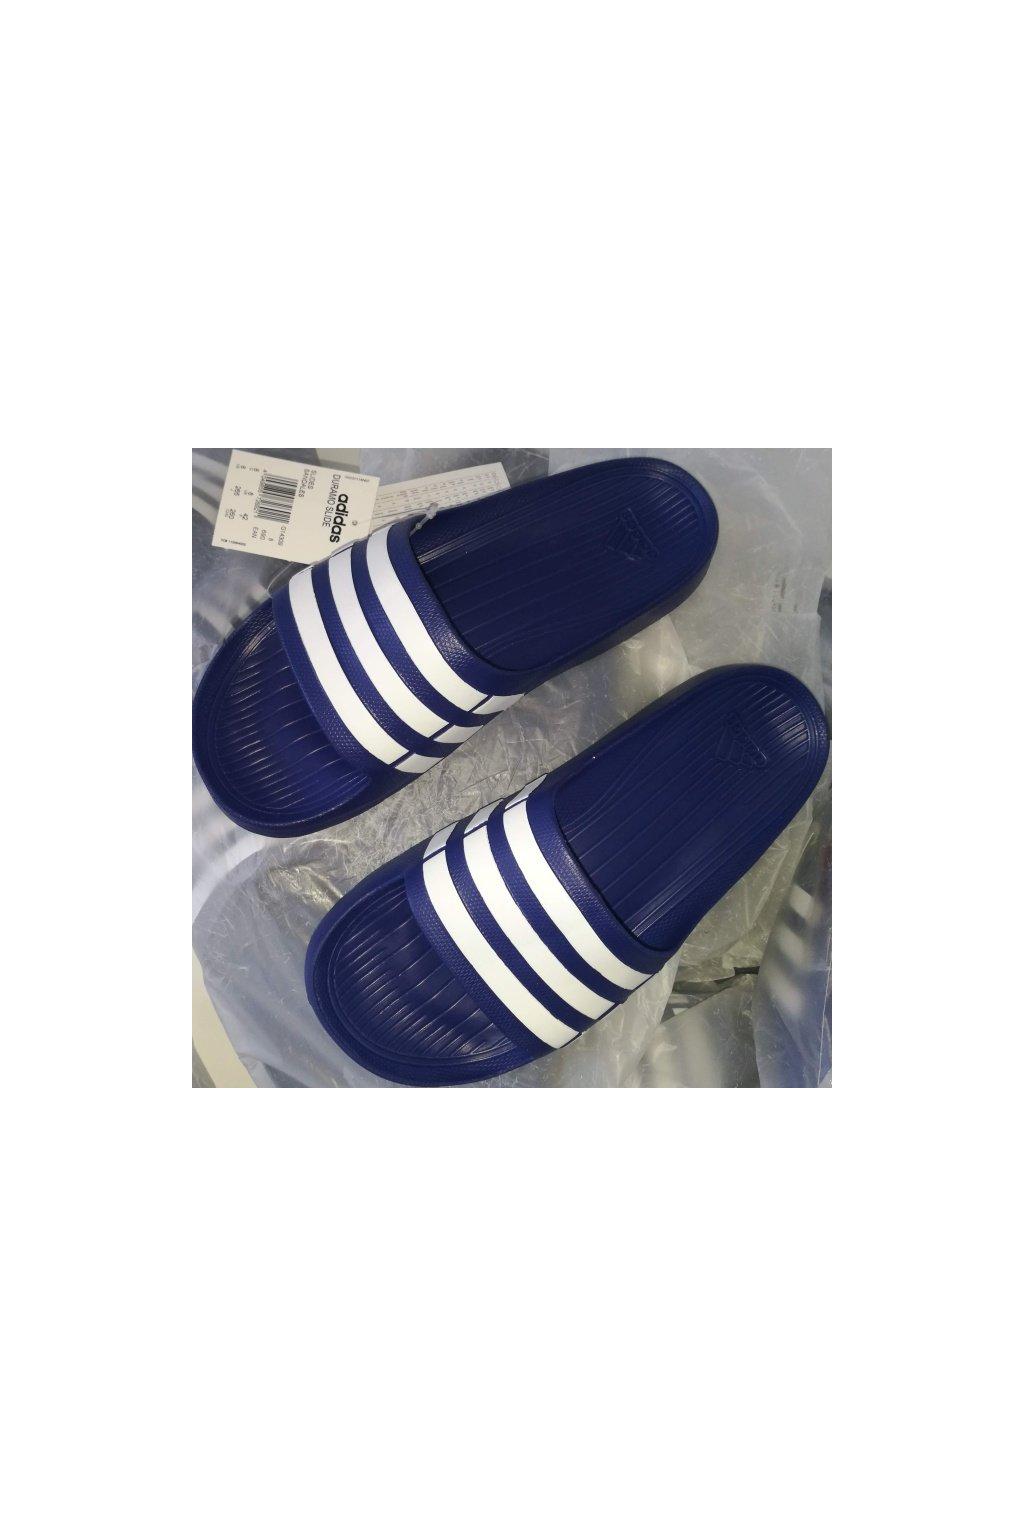 b62fc6364b7d6 Šľapky Adidas Duramo G14309 - Fresh sport